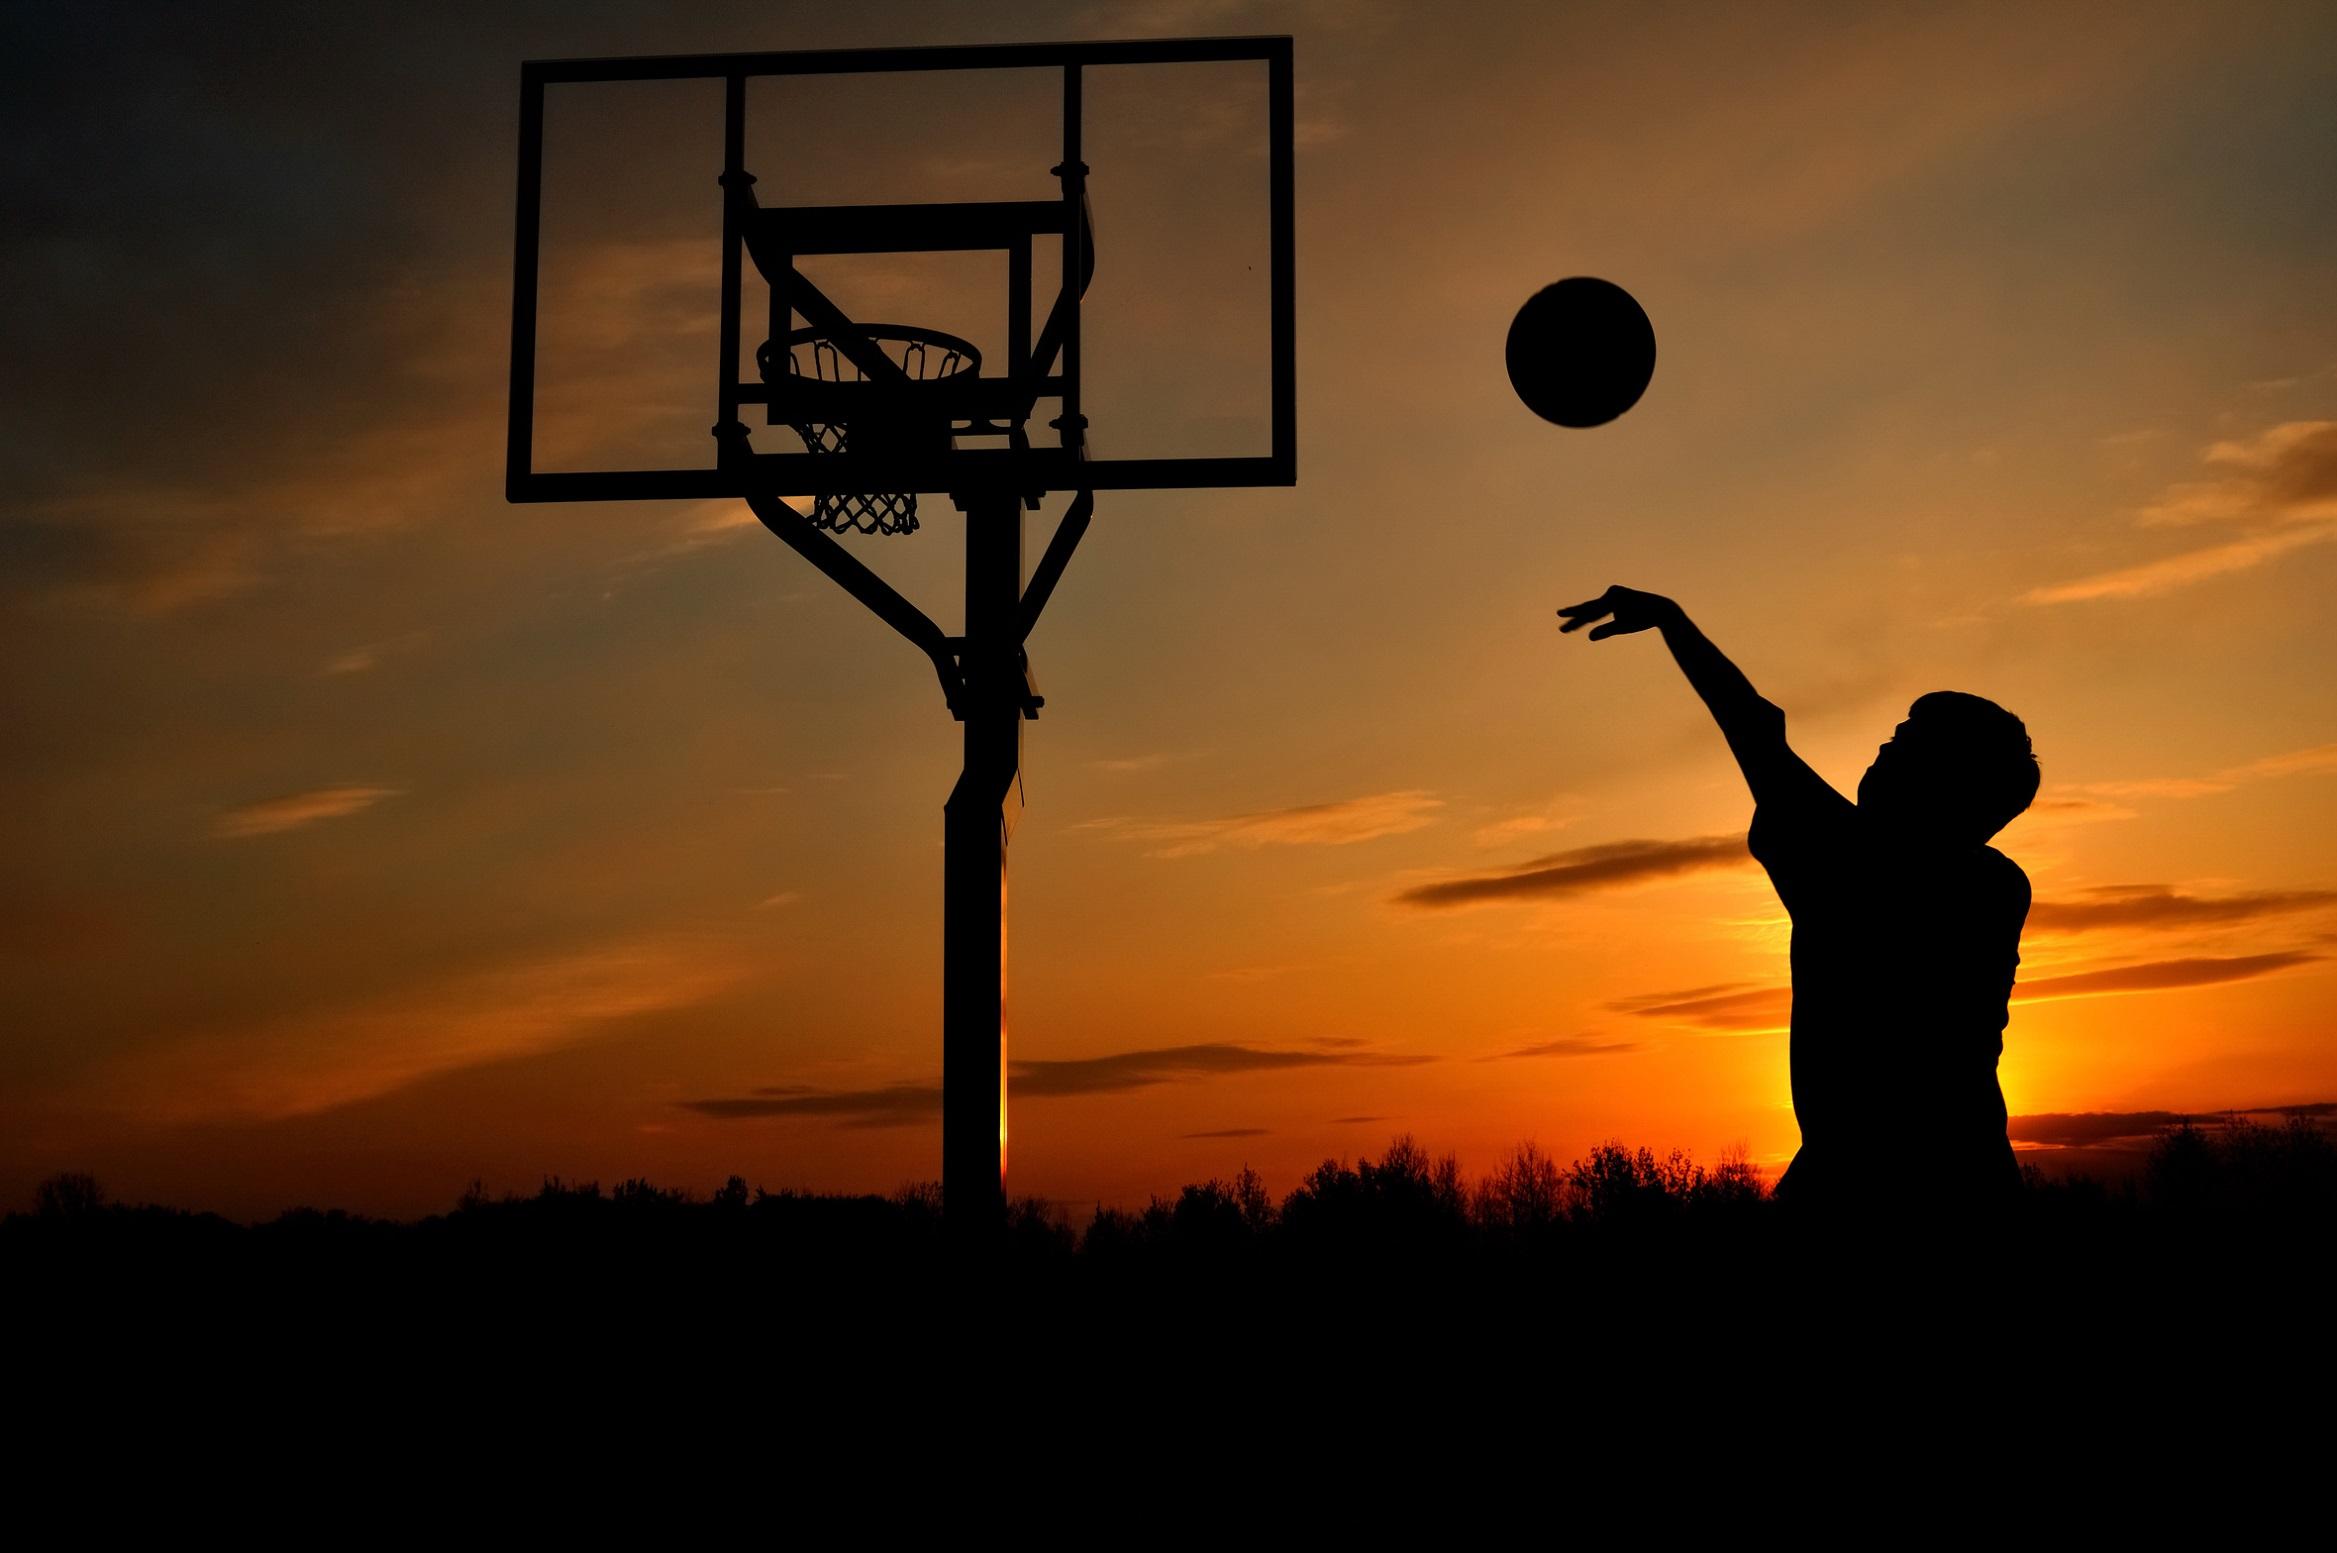 Basketball Shooting 1811550 Hd Wallpaper Backgrounds Download